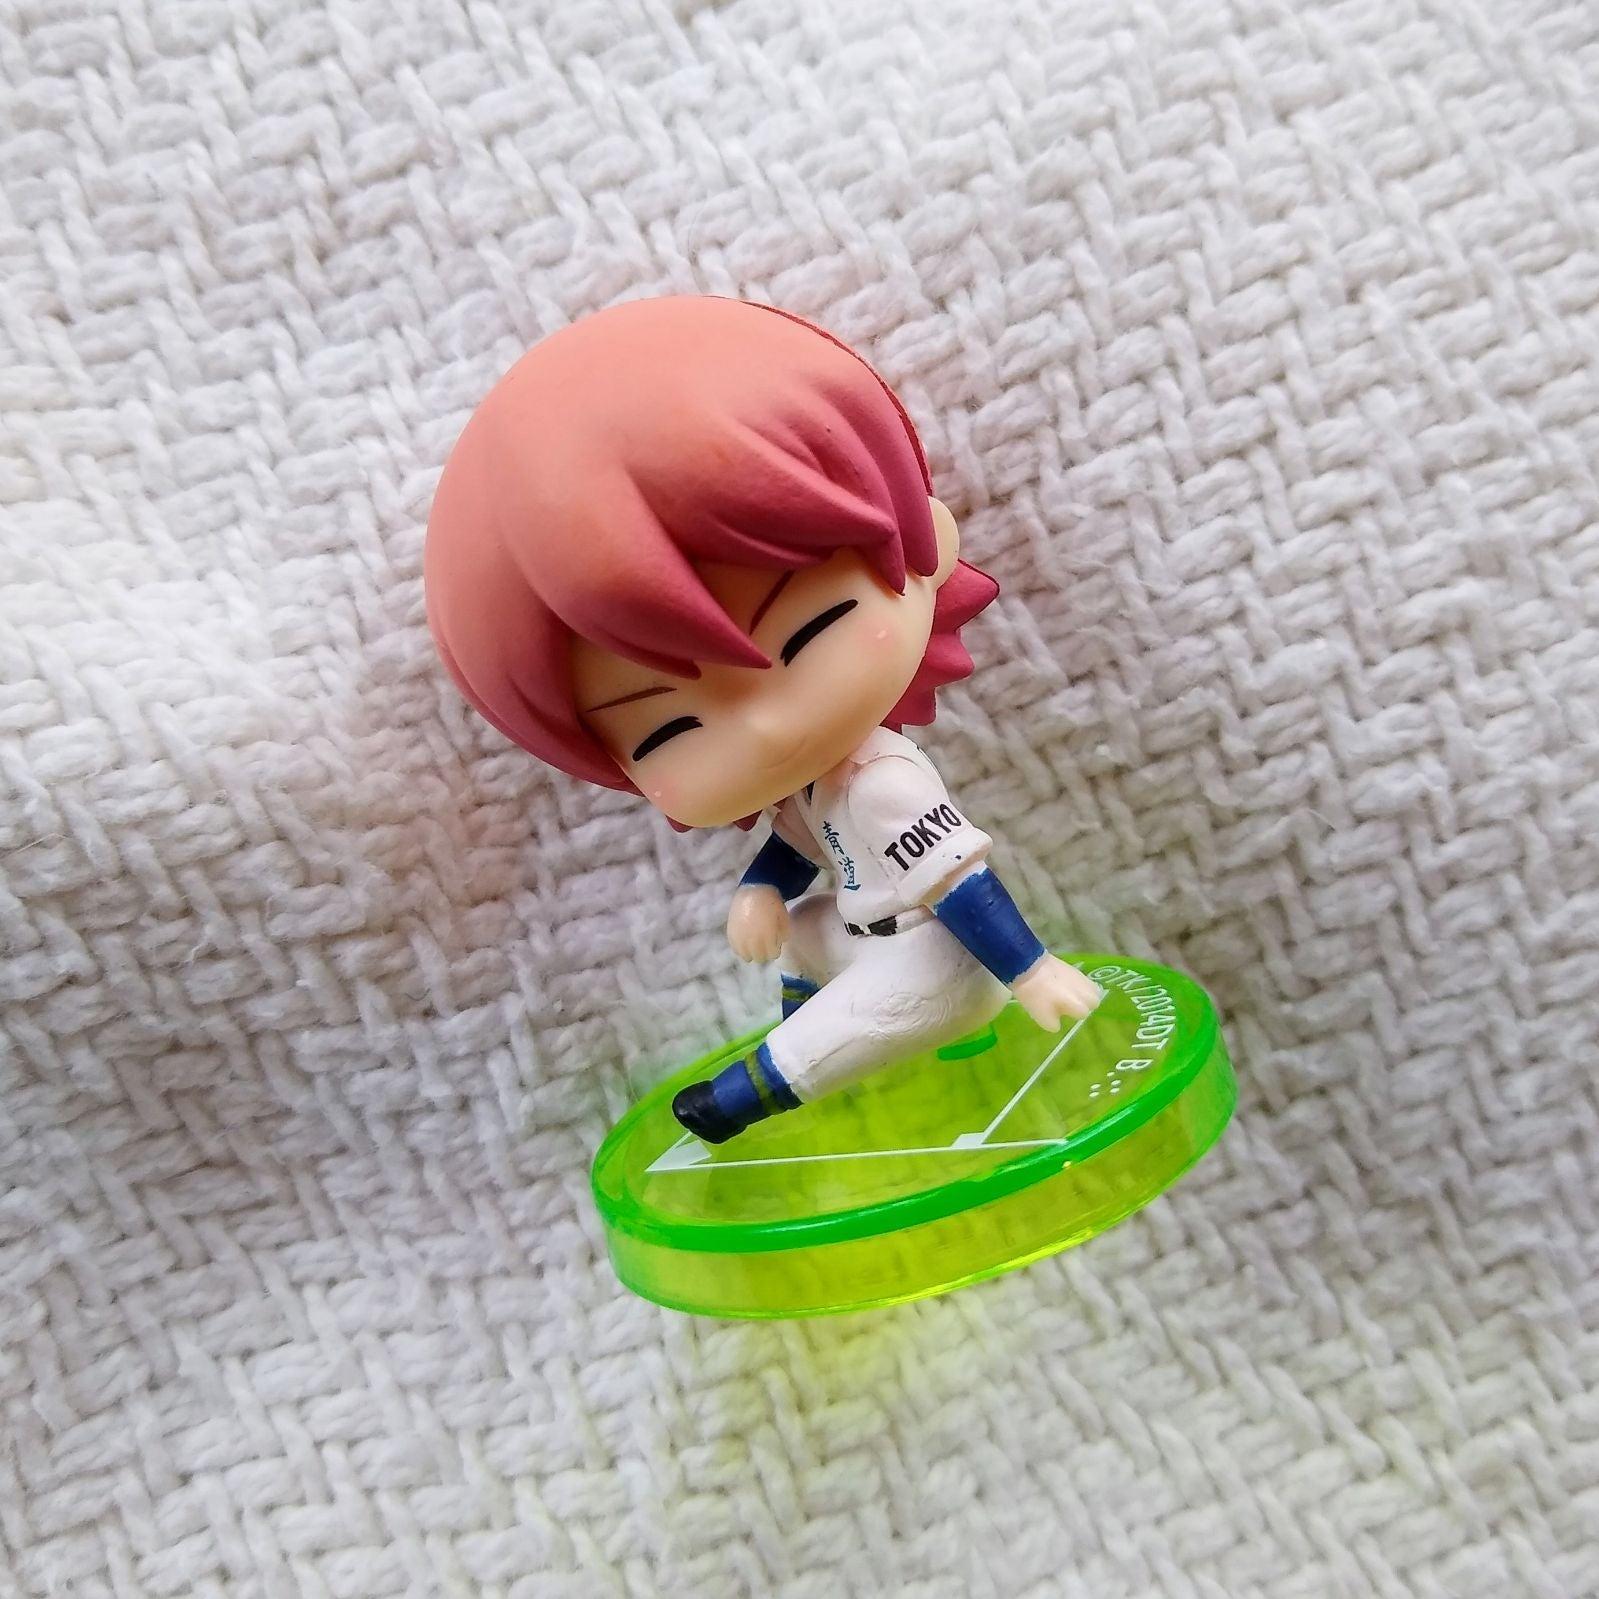 Ryousuke Kominato mini figure stand